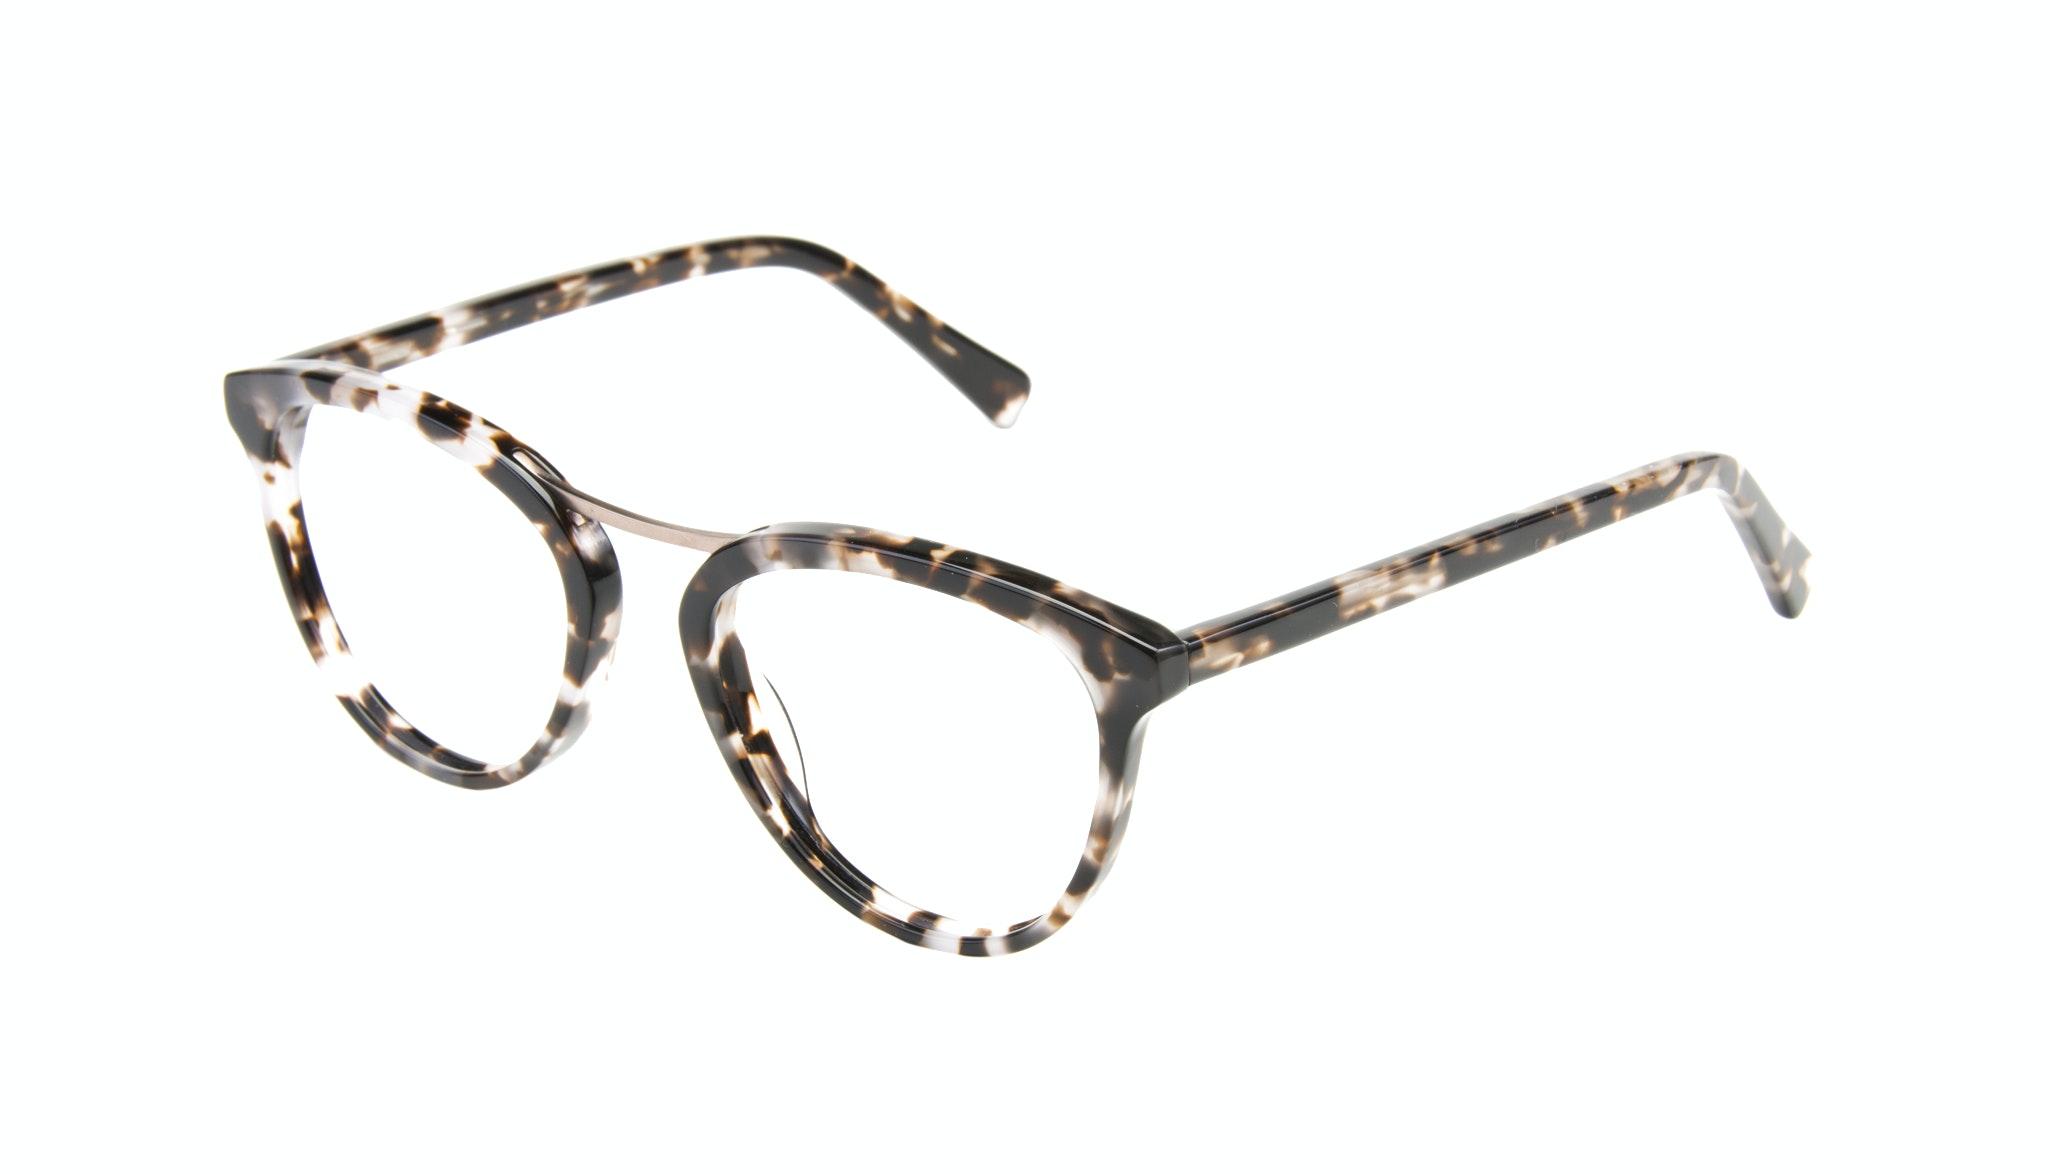 Affordable Fashion Glasses Cat Eye Round Eyeglasses Women Reef Sand Tilt